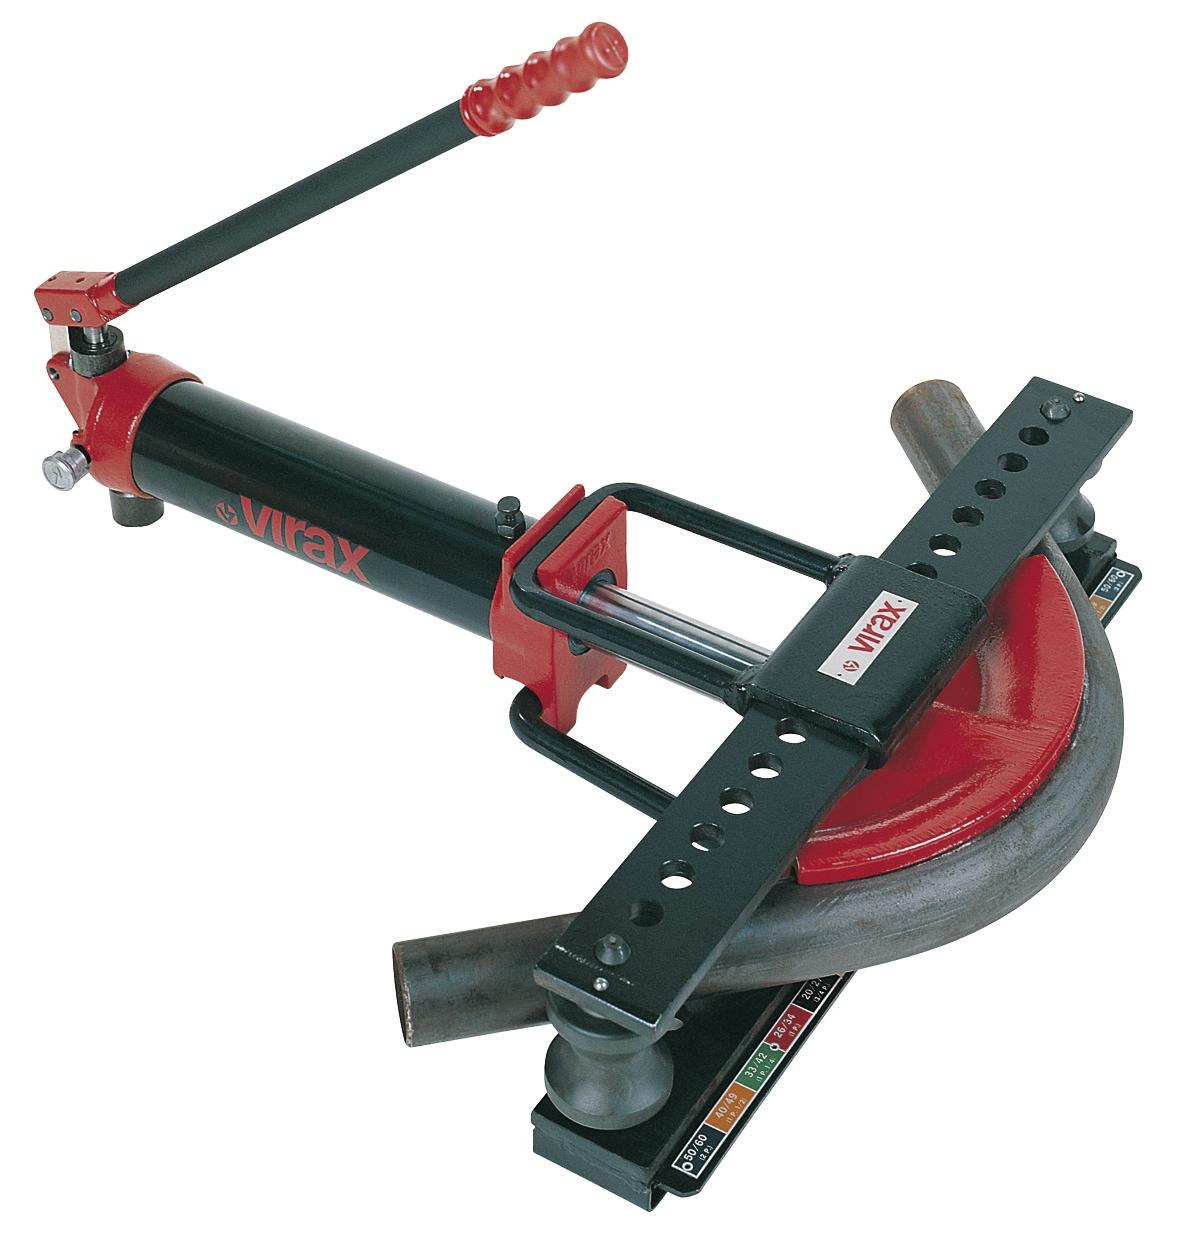 Cintreuse hydraulique manuelle N°2 Virax